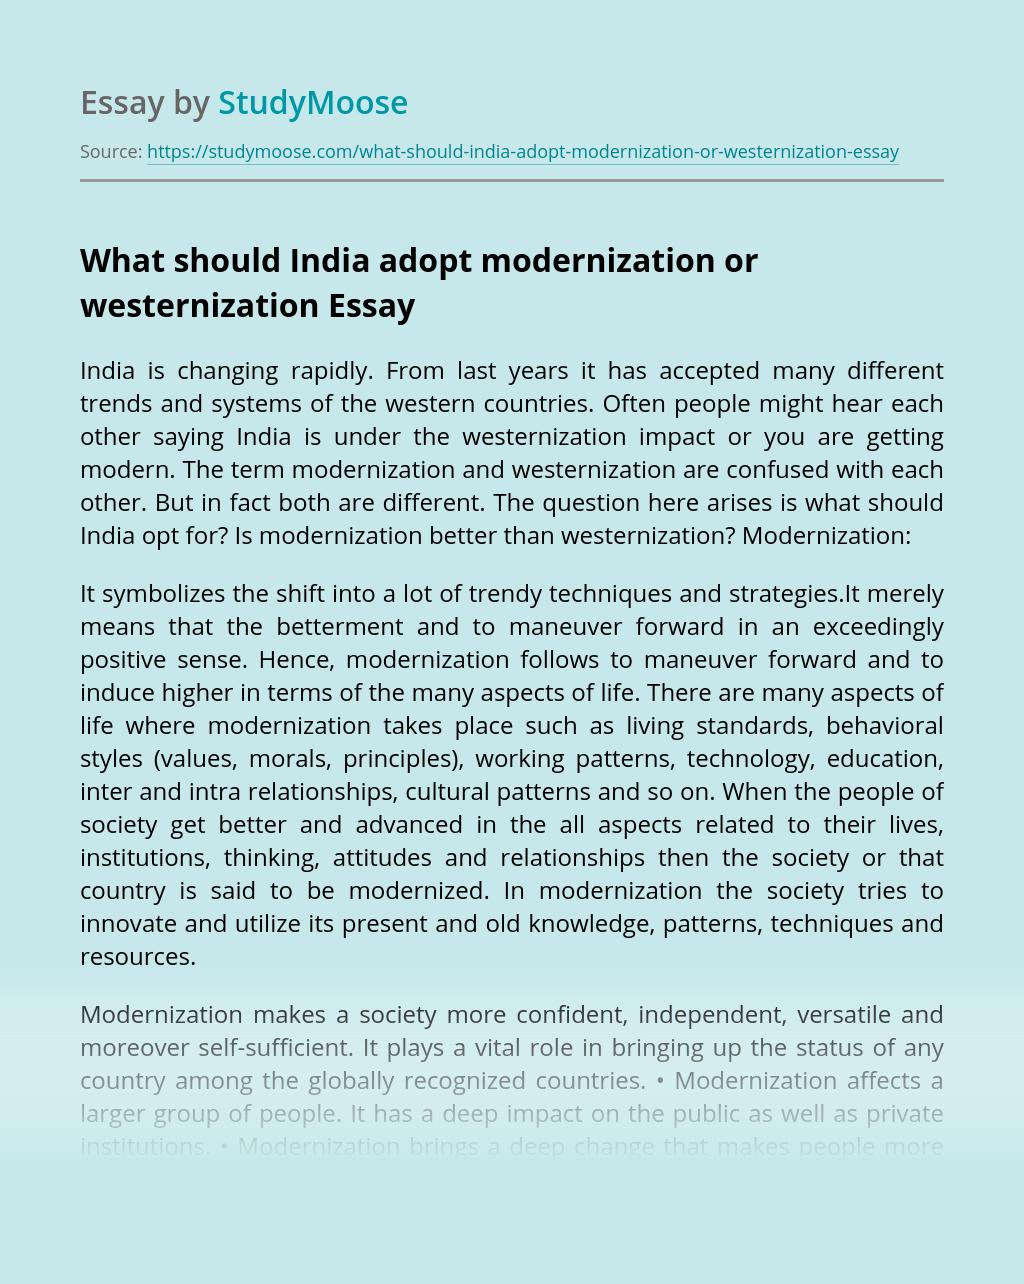 What should India adopt modernization or westernization